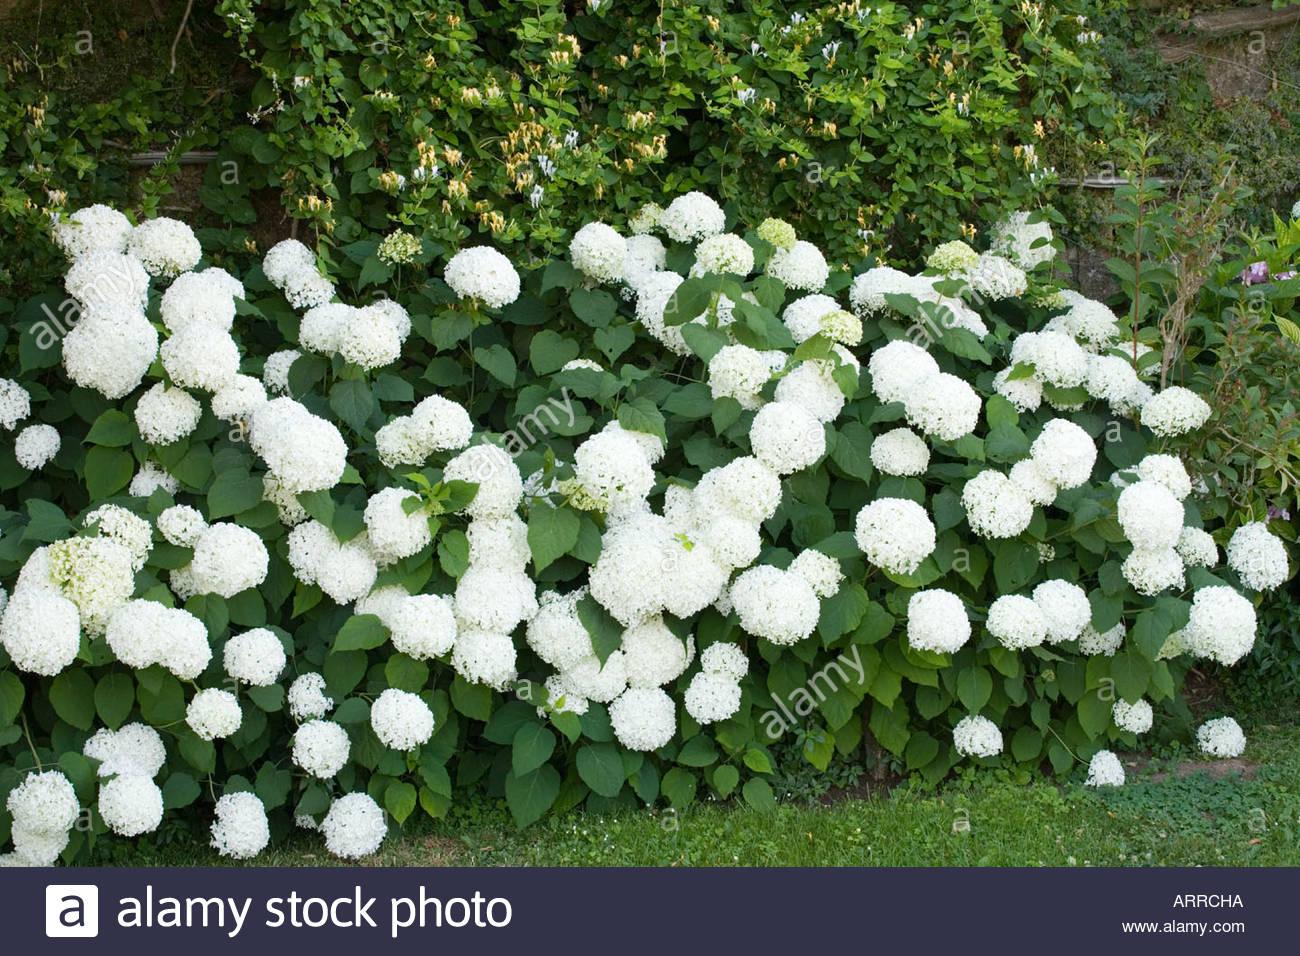 Hortensie Annabell hortensie annabelle incrediball hydrangea ustrong annabelleu